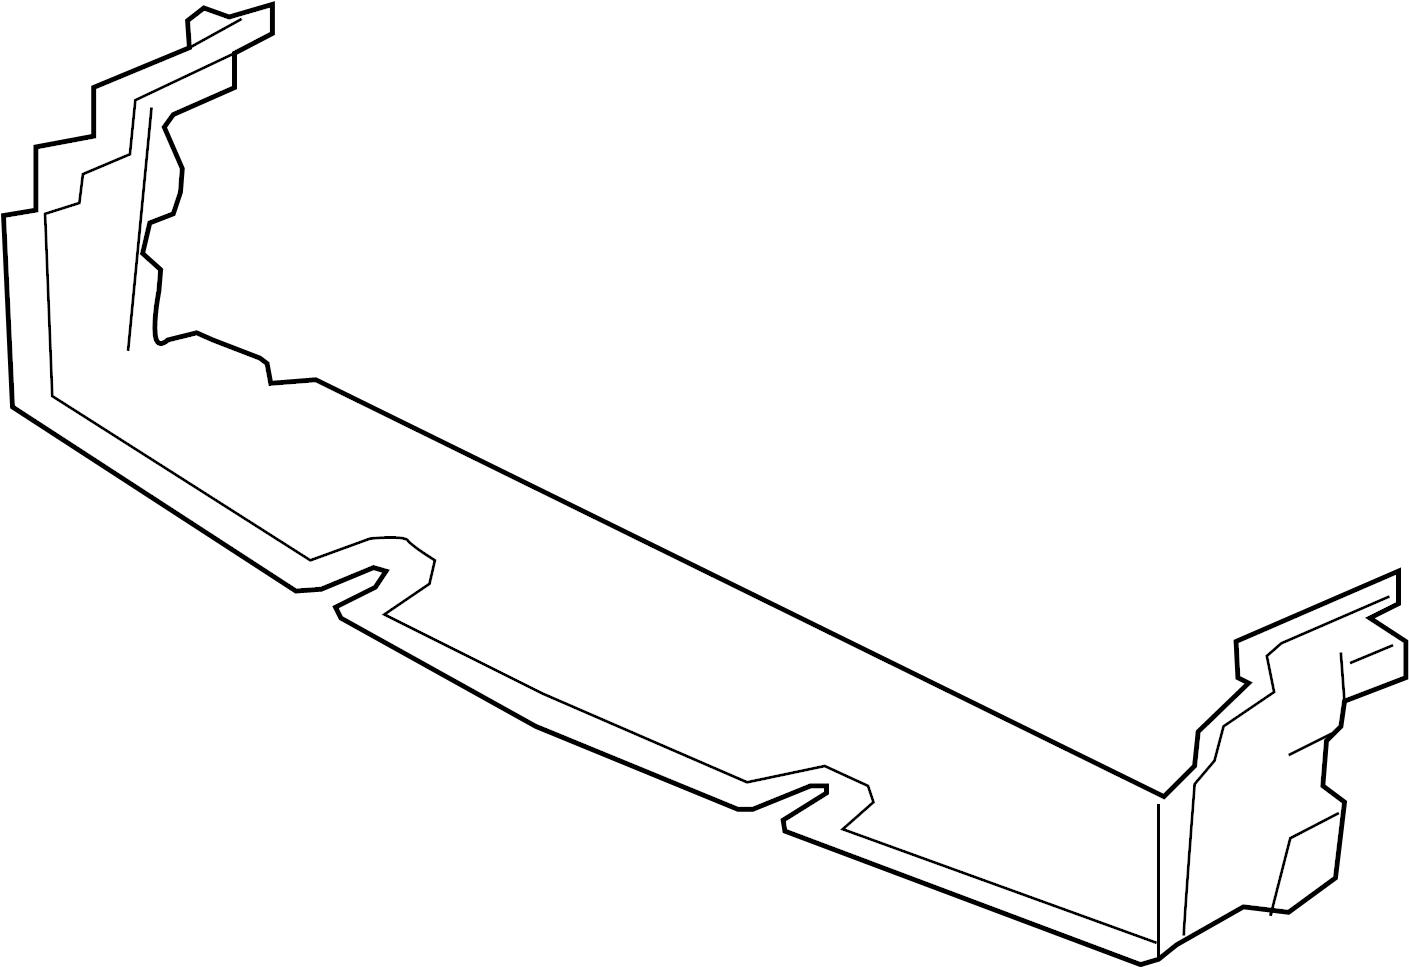 Jaguar F Pace Deflector Shield Lower Deflector Radiator Support Air Deflector Shield